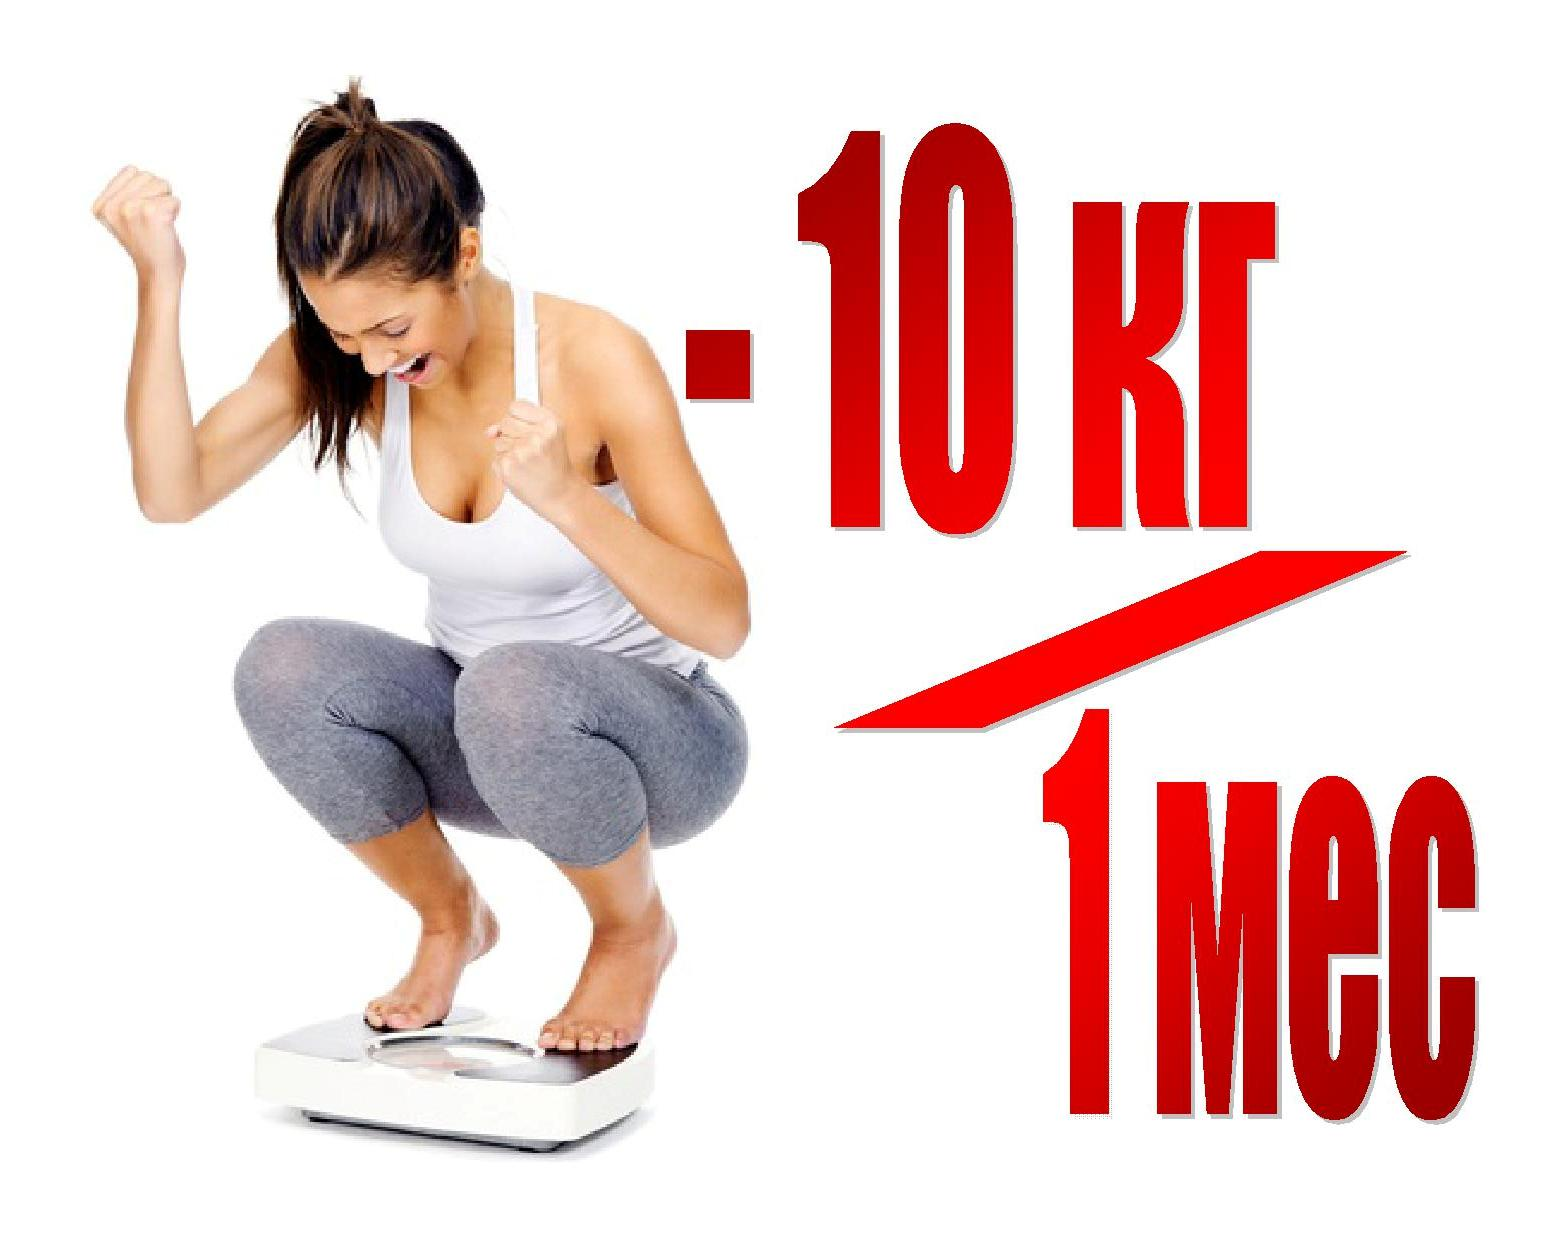 похудеть на 10 кг за месяц